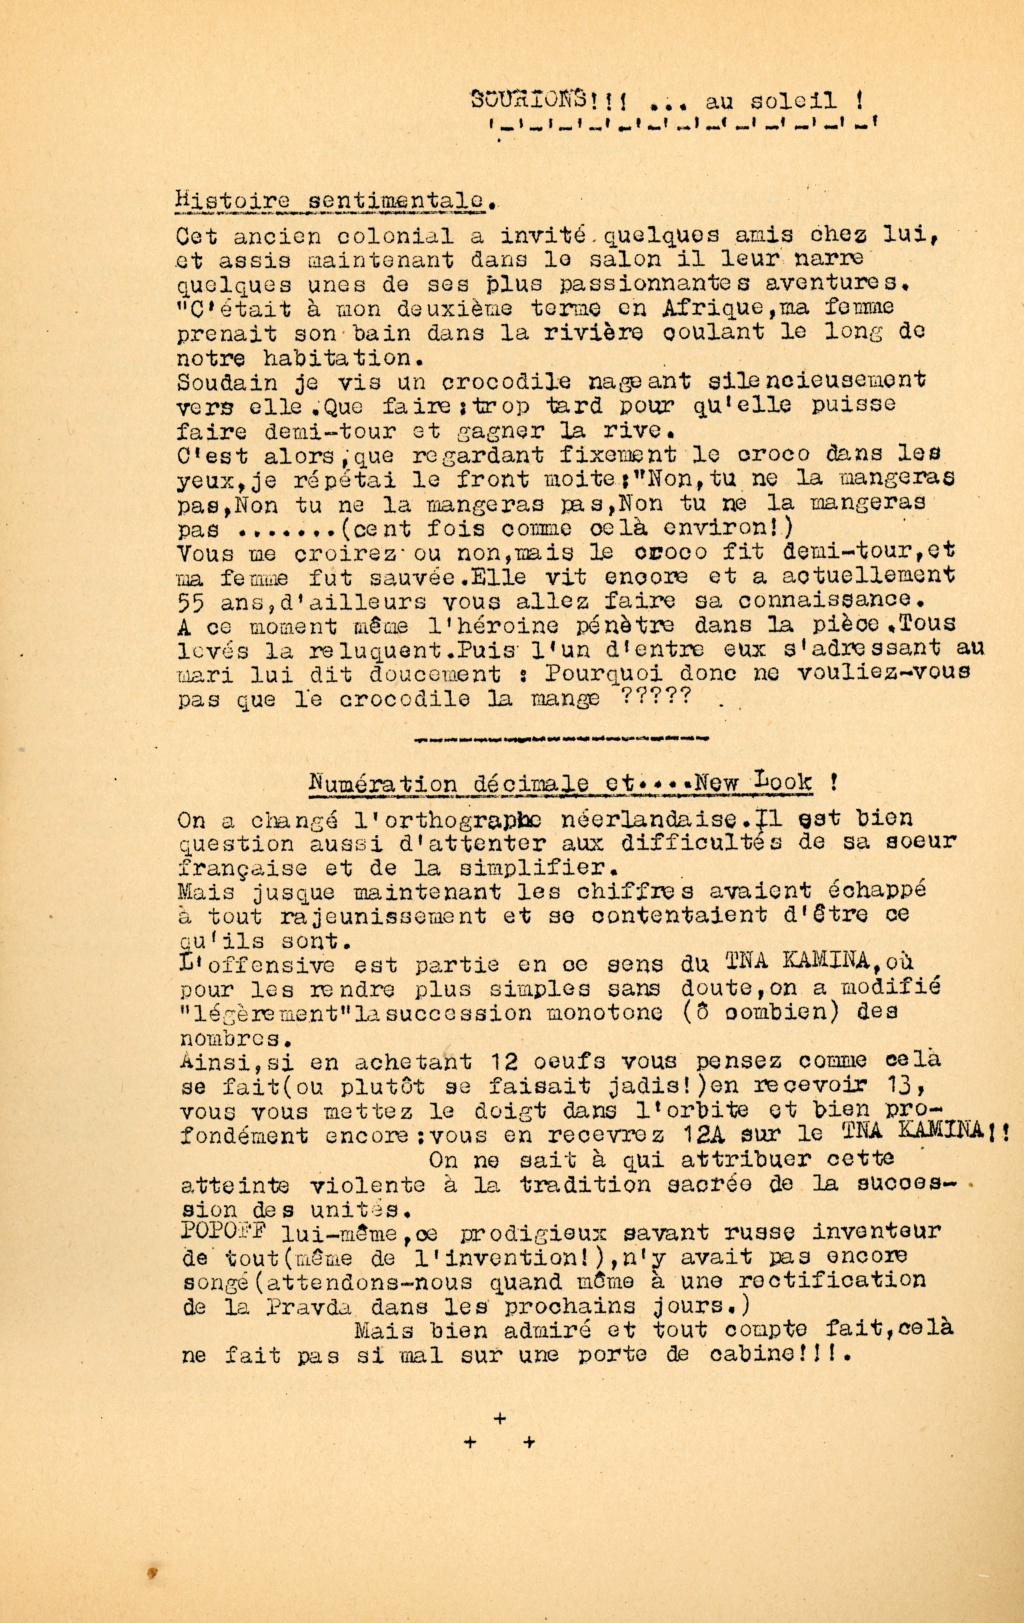 Photos du Kamina 8/8 au 22/09/57 Transport de troupes  - Page 2 Img10810